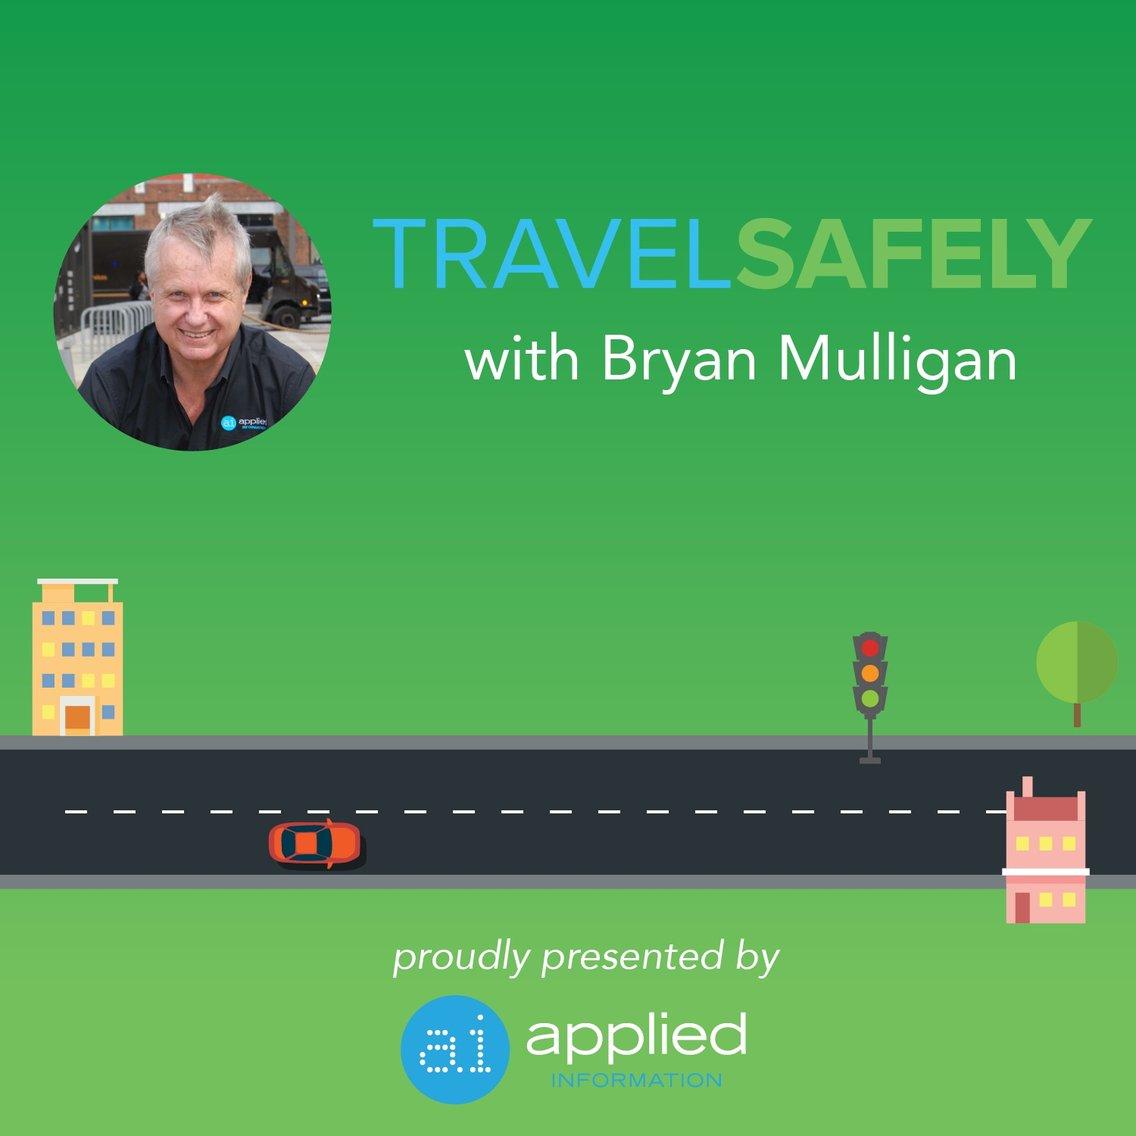 TravelSafely with Bryan Mulligan - imagen de portada